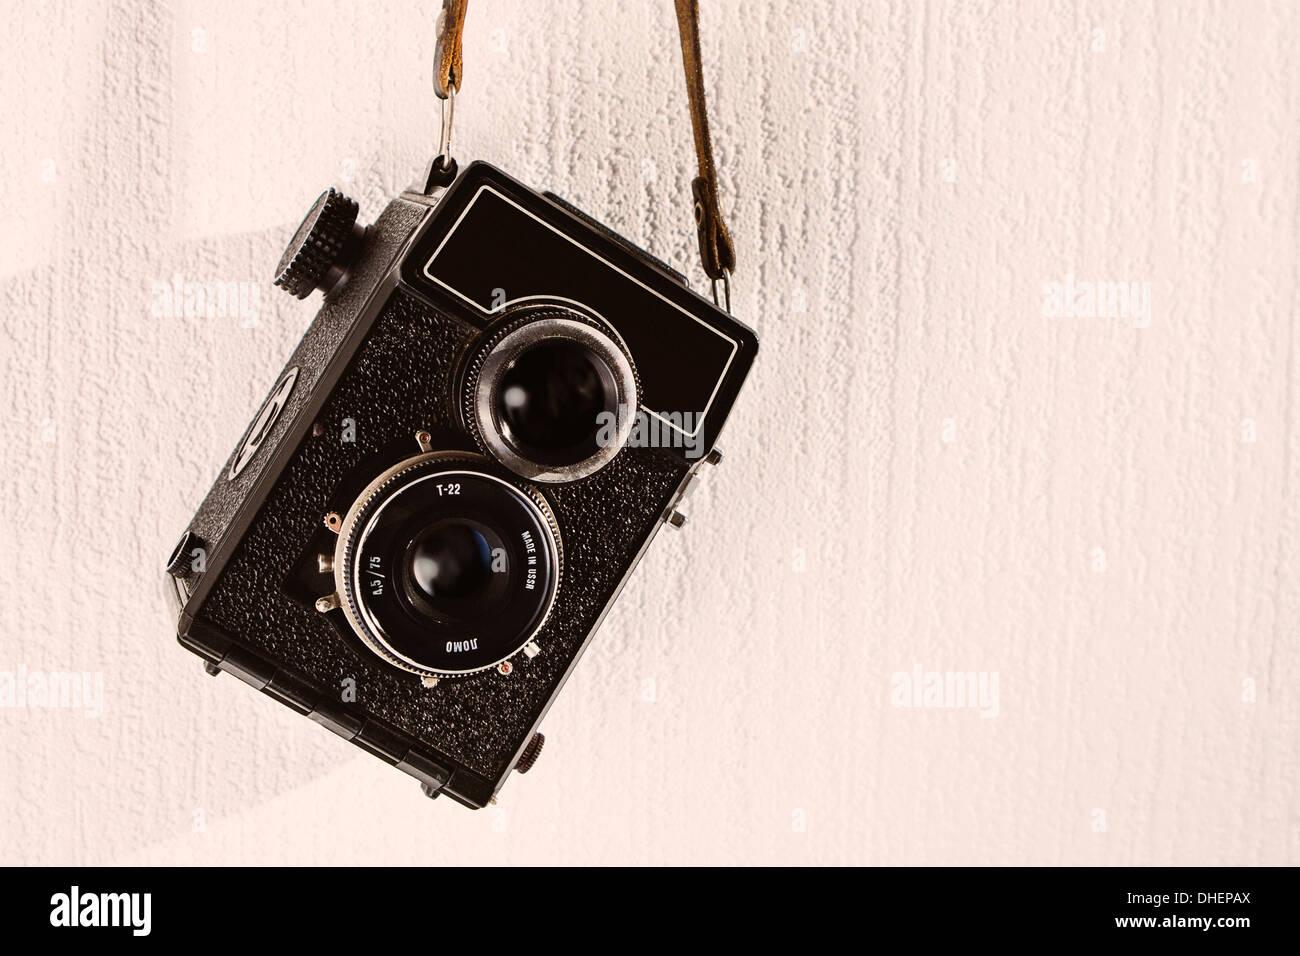 Soviet camera - Stock Image